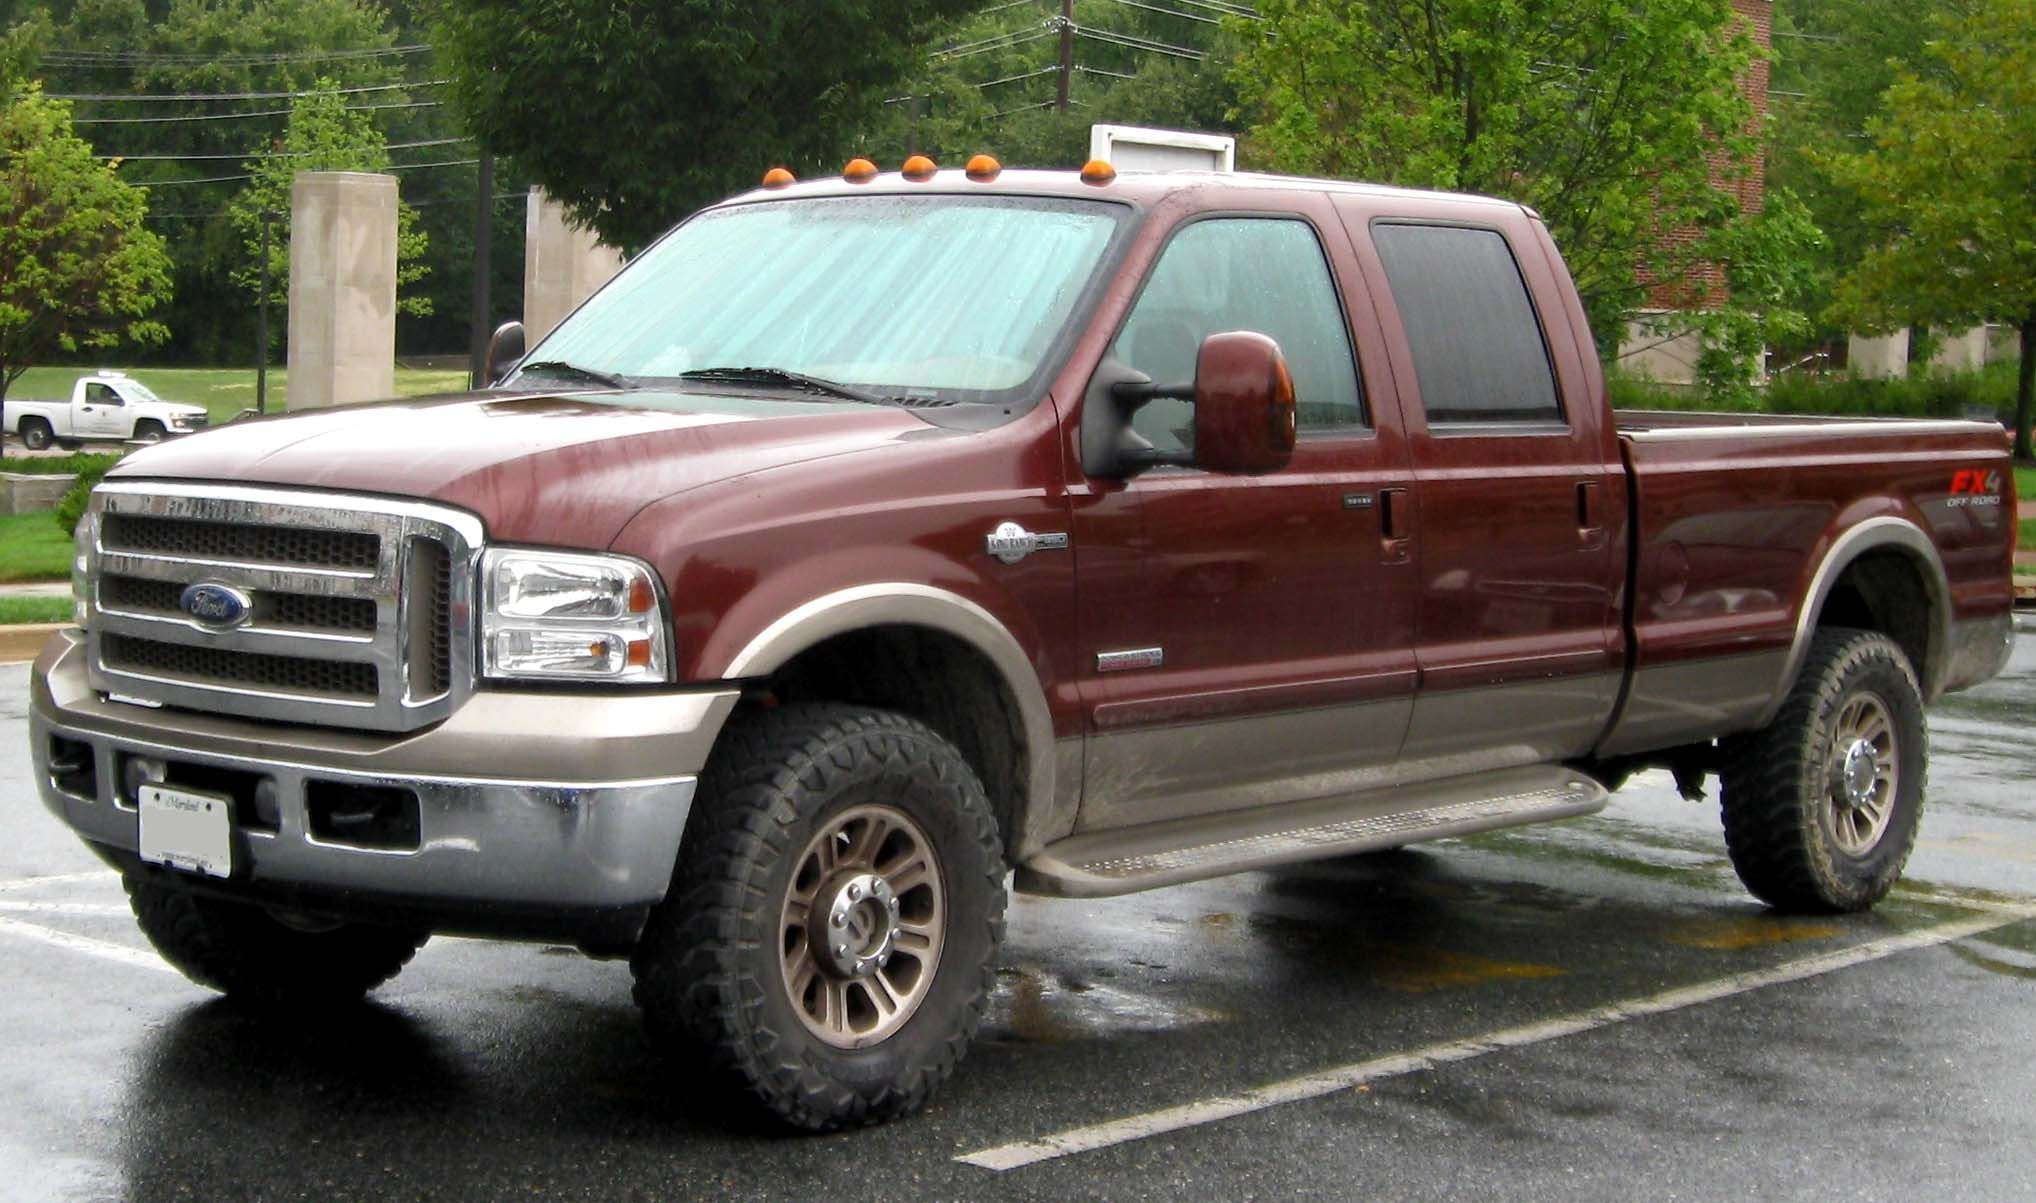 Truck For Hauling Ford Super Duty Ford Trucks